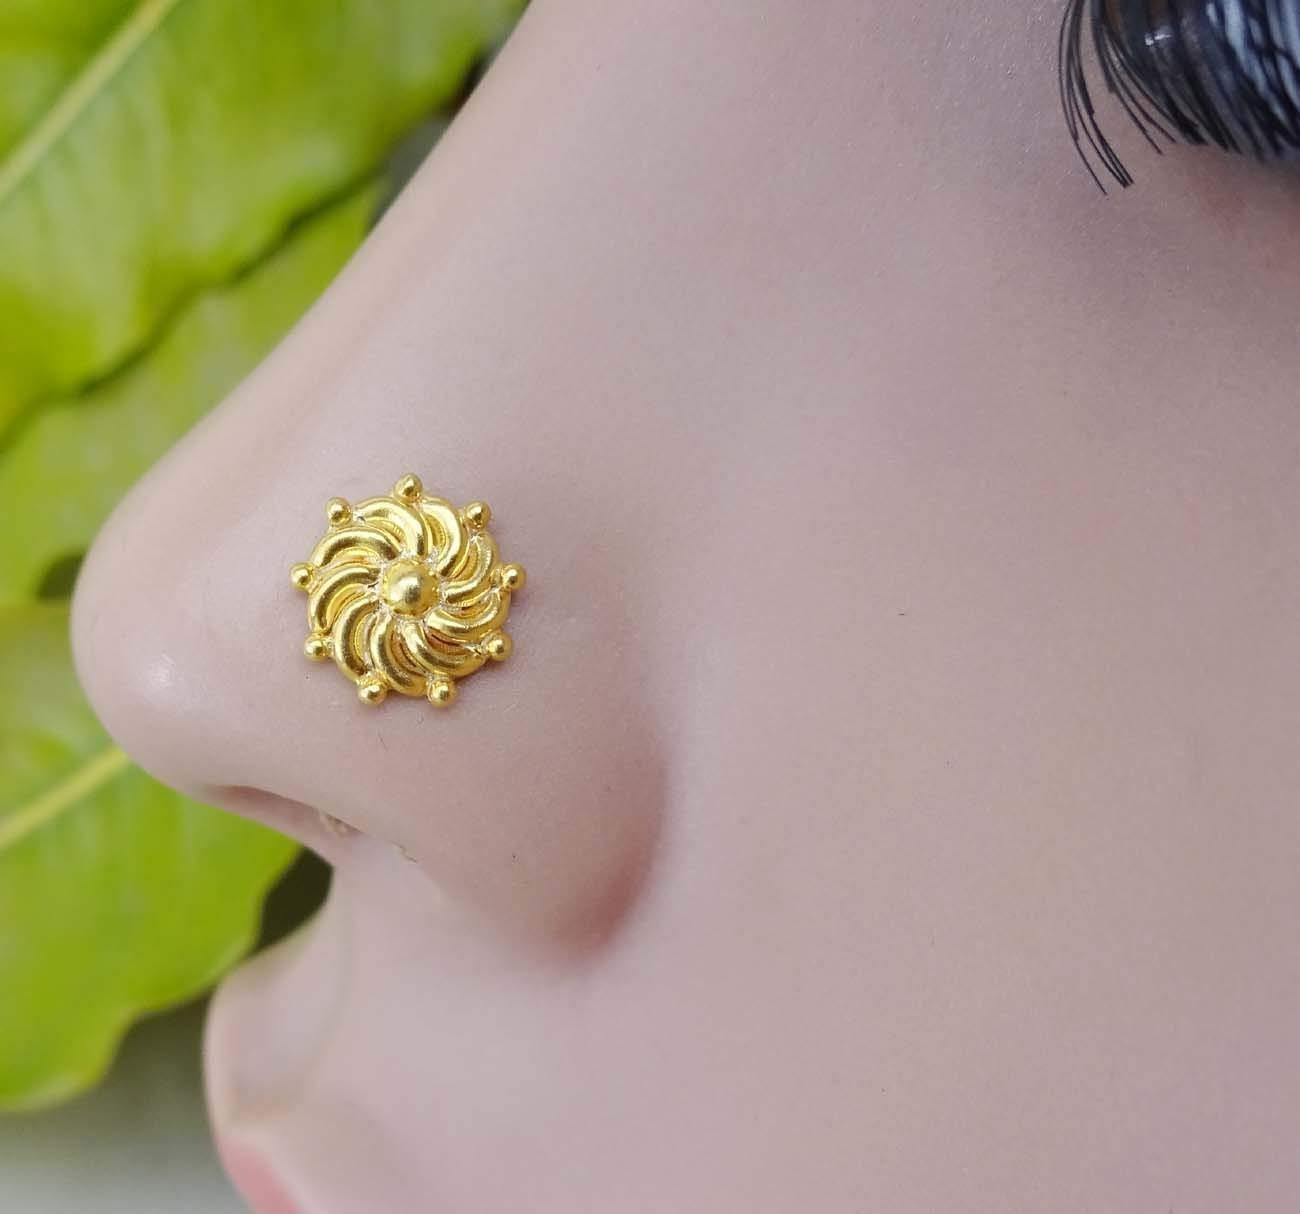 Gold Nose Piercing,Indian Nose Screw,Crock Screw Nose Stud,Indian Nose Stud,925 Sterling Silver nose stud,Gold Nose Screw,Unique Nose Stud,22 G Nose Stud,Gold Nose Pin,Gold Nose Piercing (TEJ073)